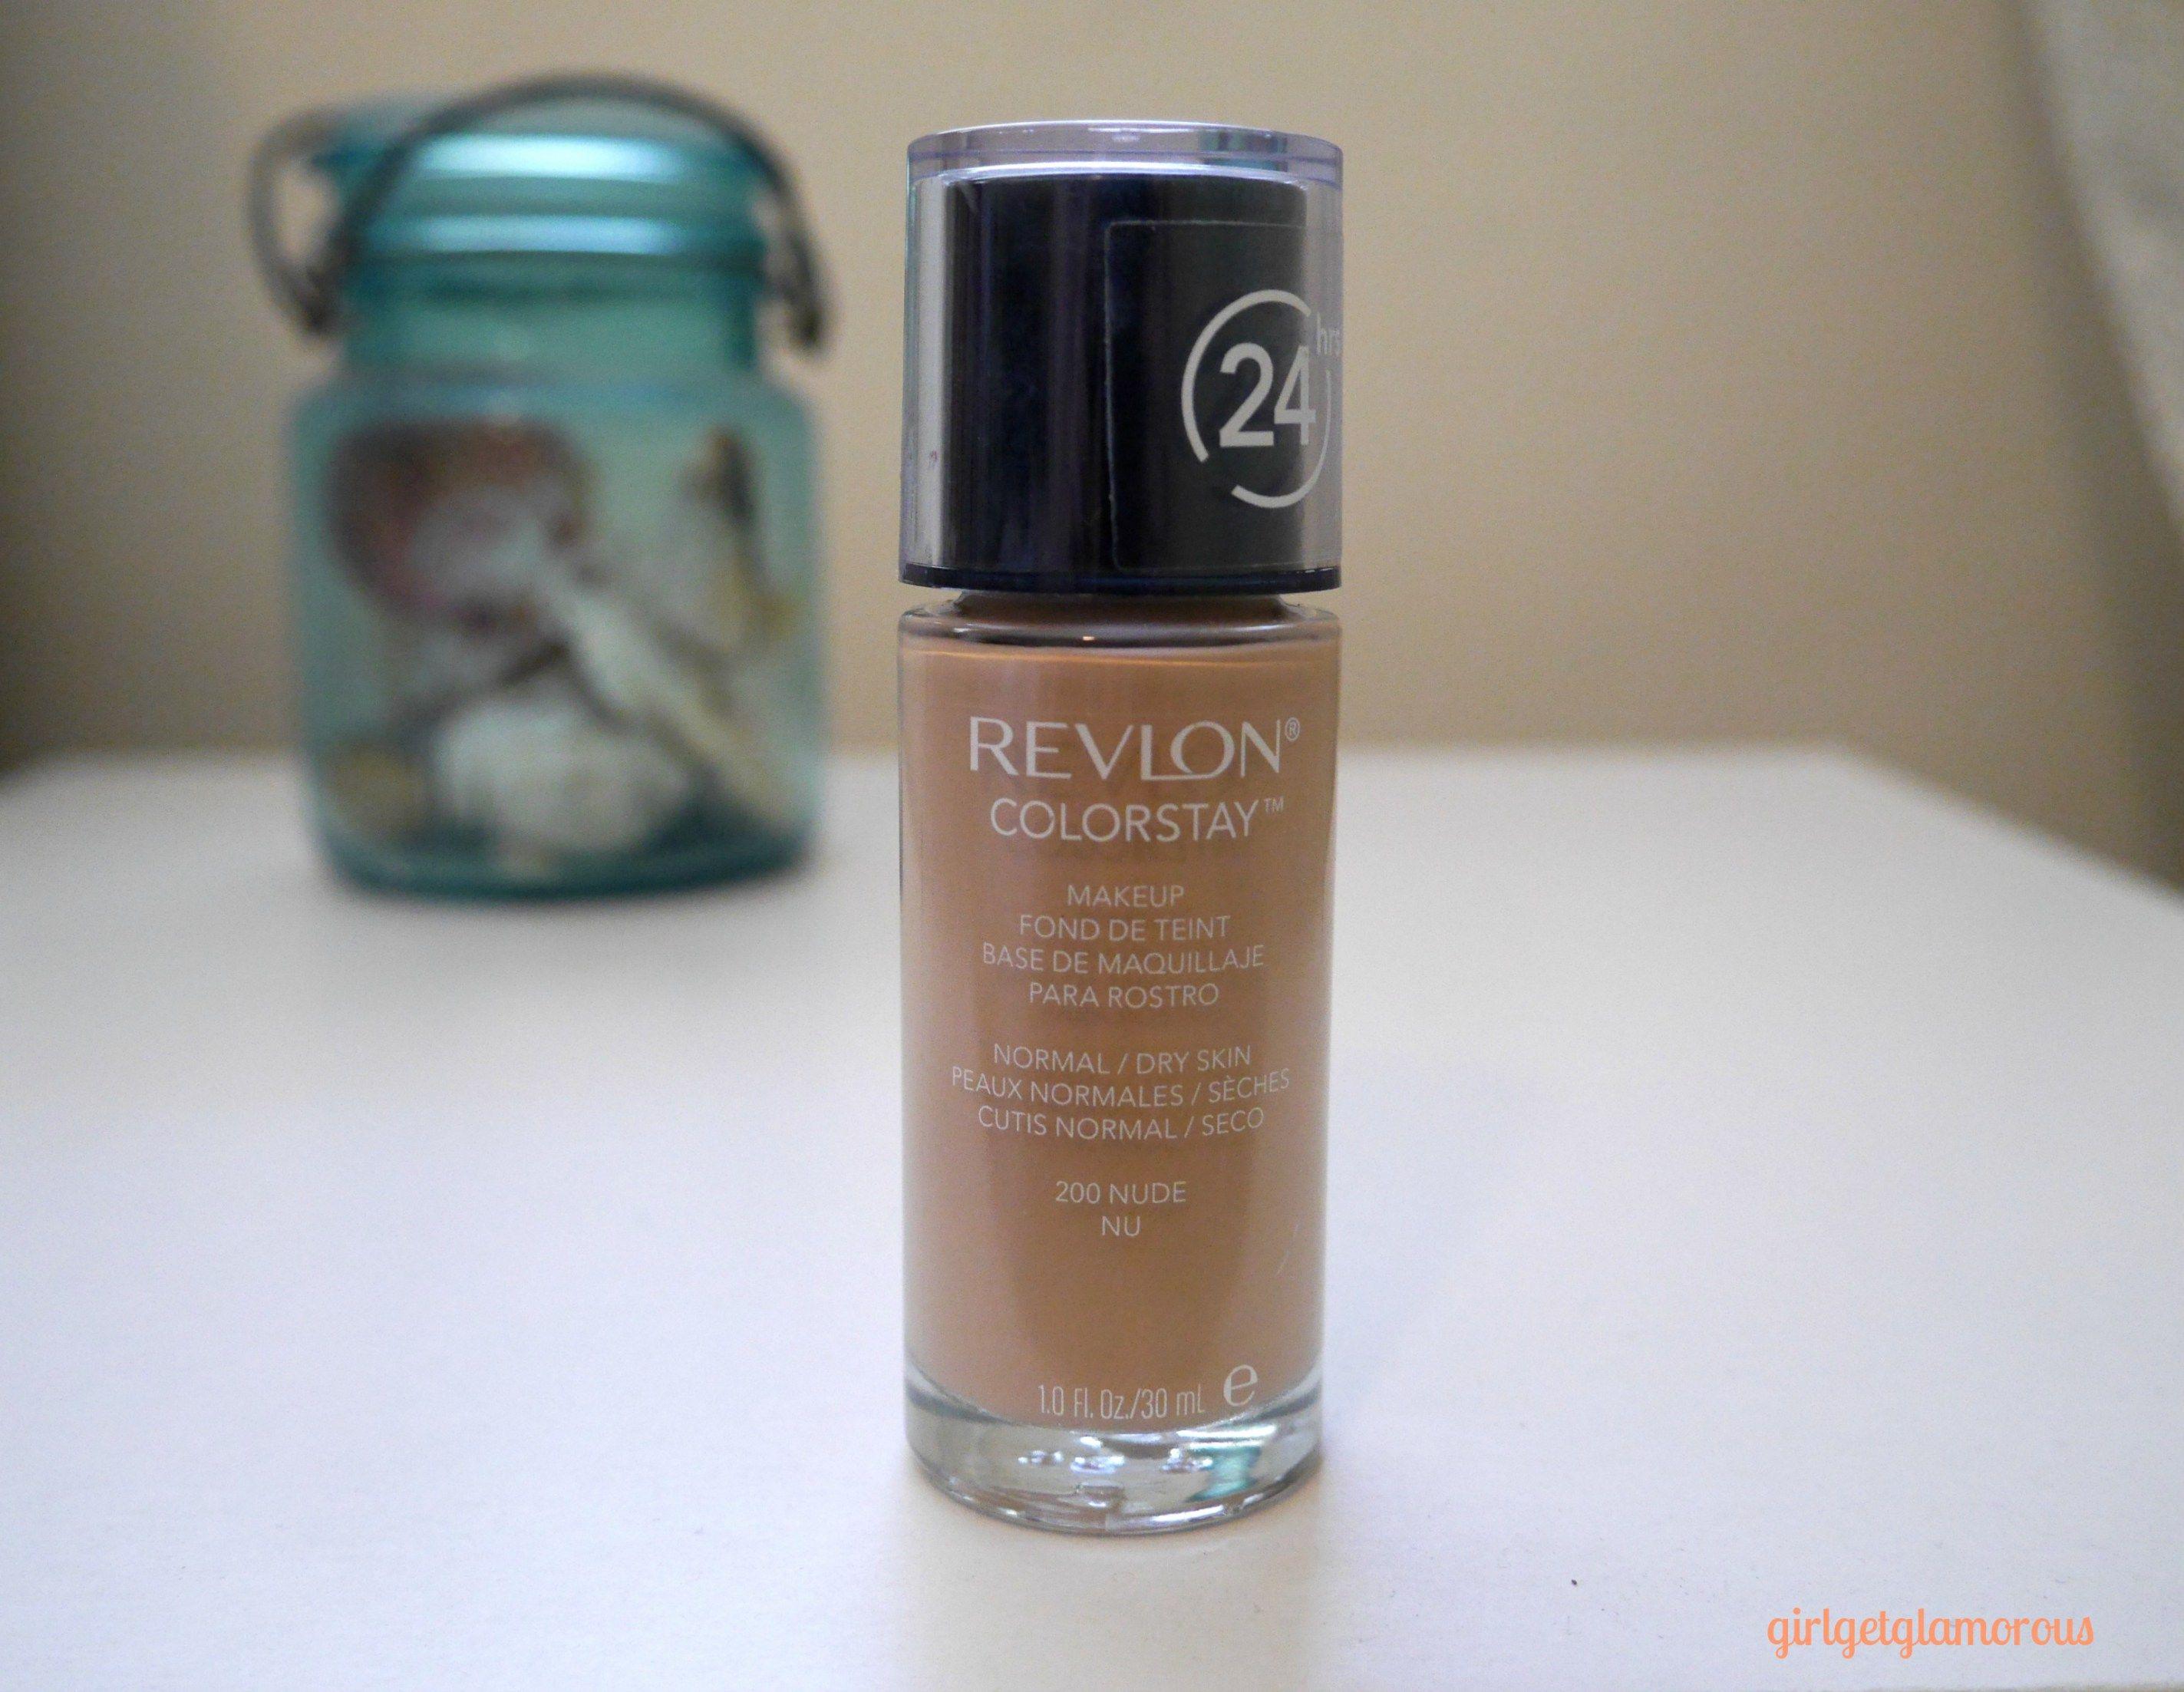 Revlon Colorstay Foundation Normal.Dry Skin Revlon